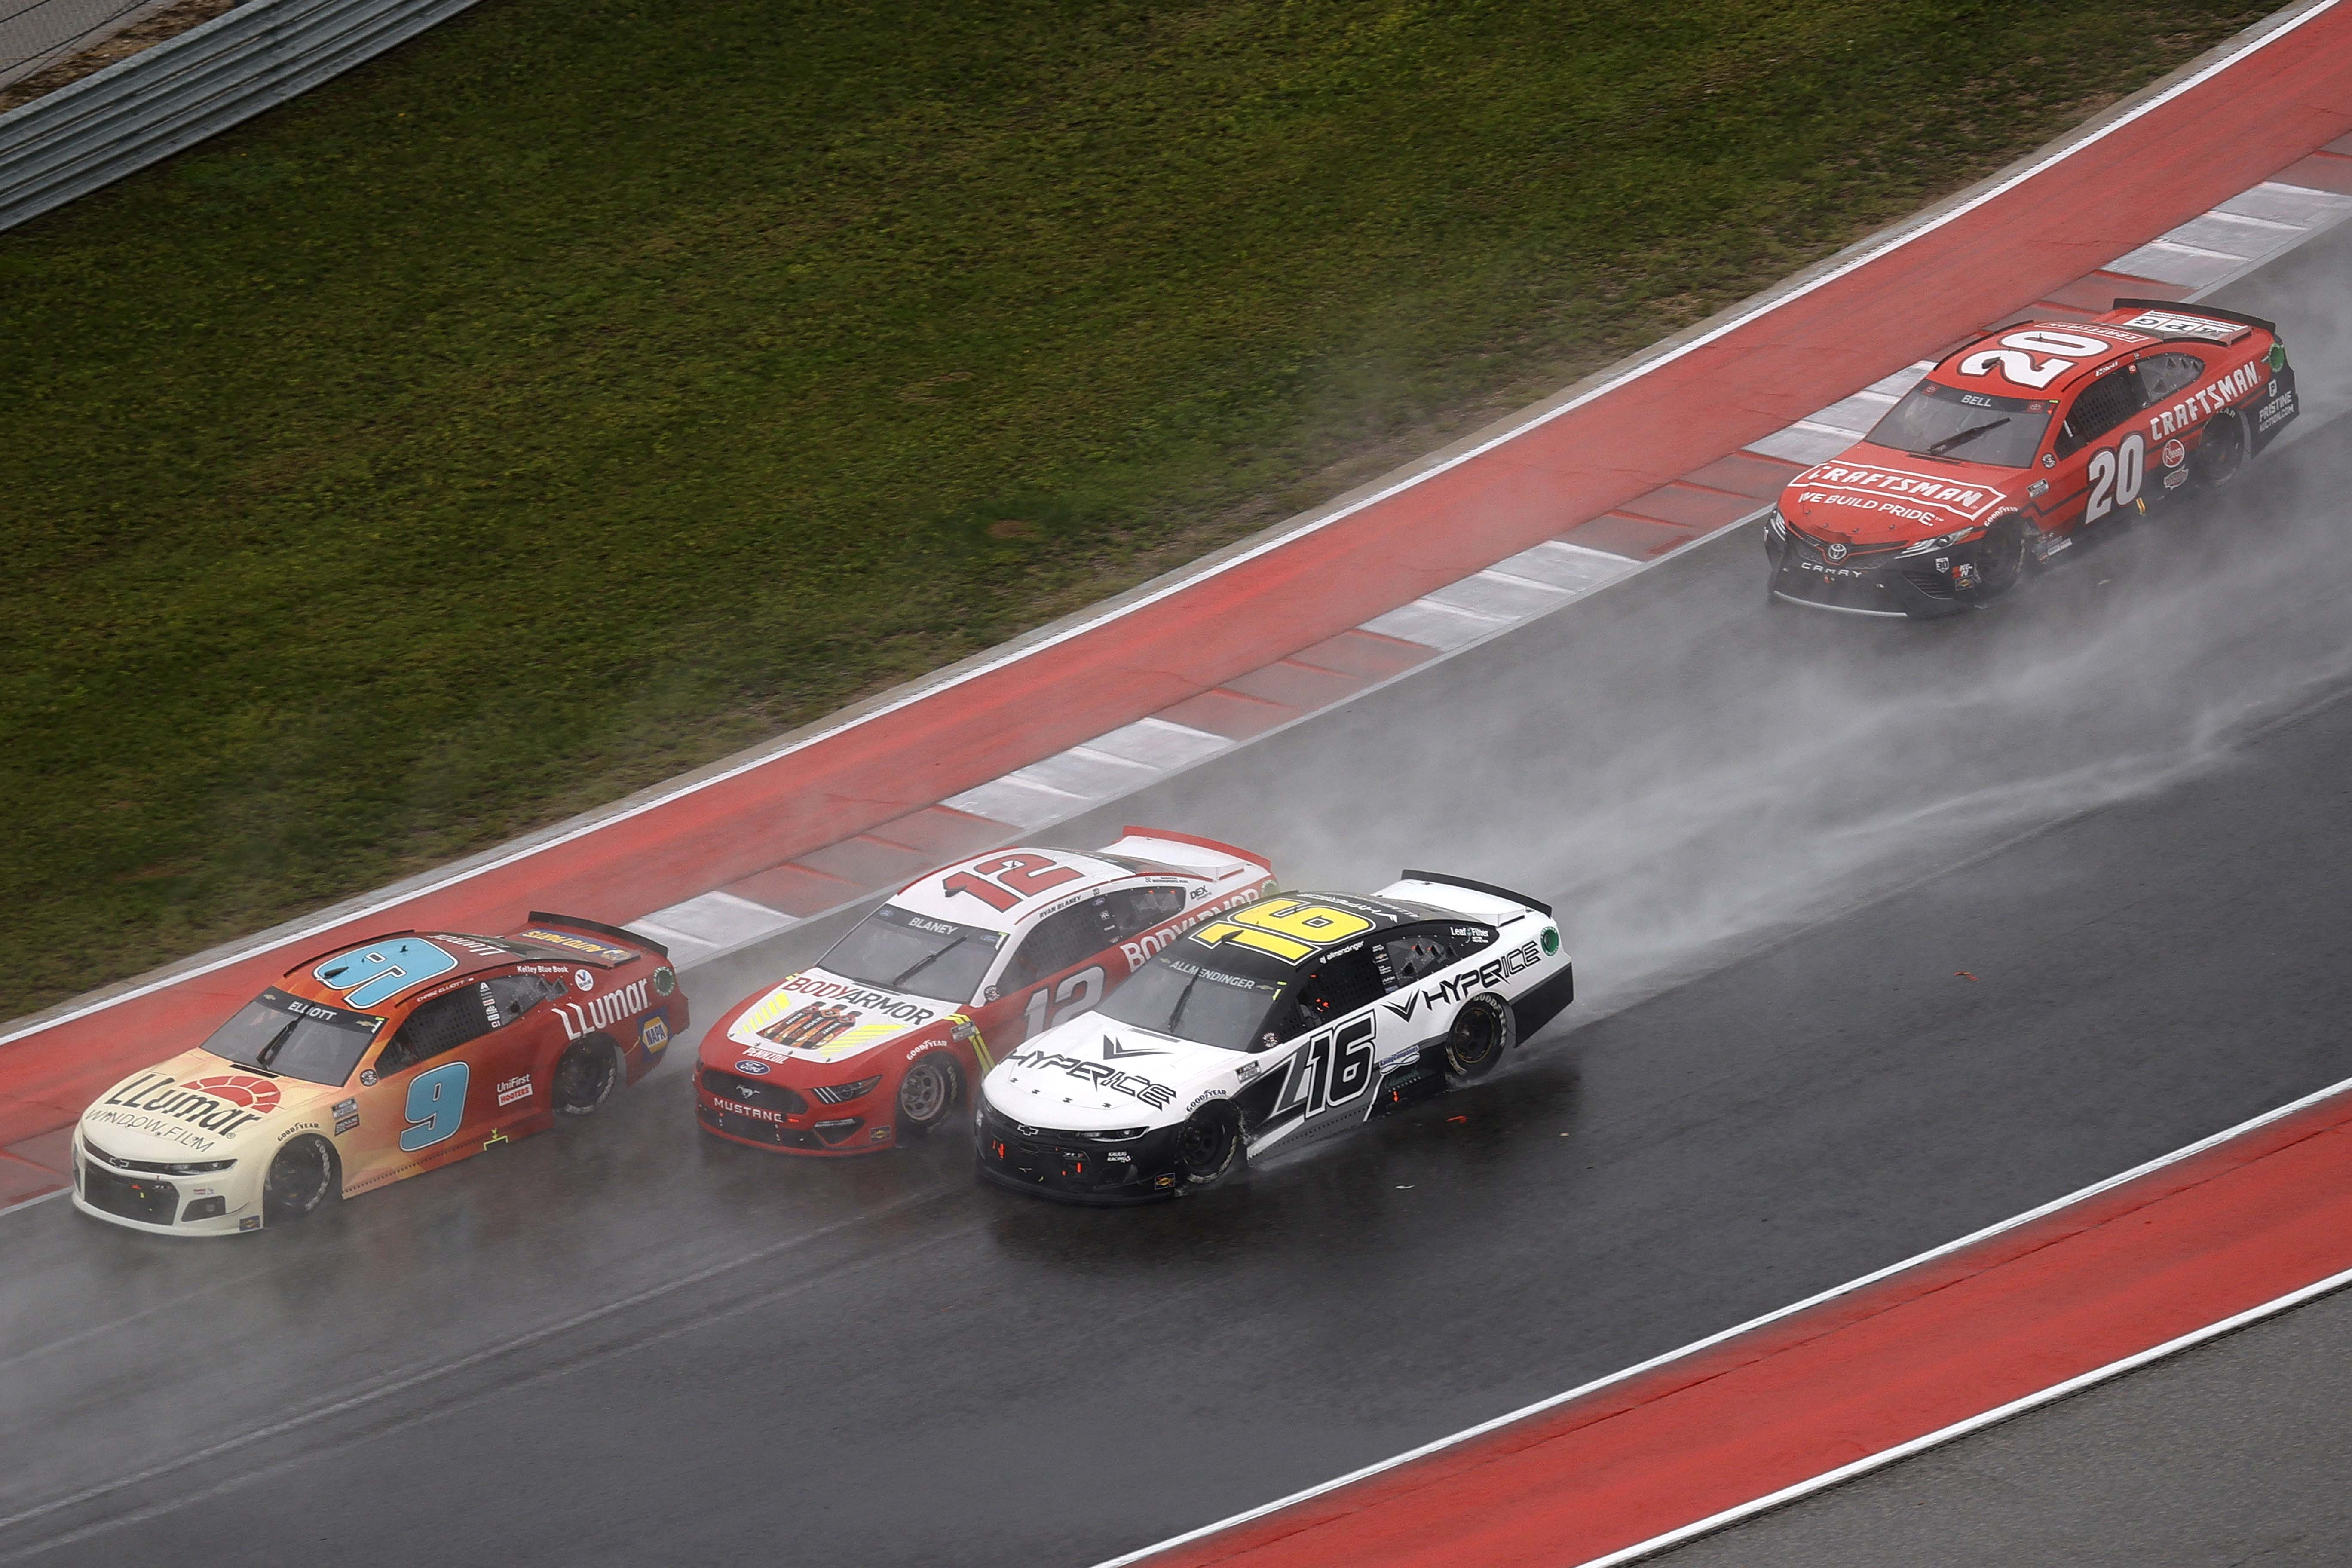 Chase Elliott, Ryan Blaney, AJ Allmendinger, Christopher Bell - Three wide - Circuit of the Americas - COTA - NASCAR Cup Series